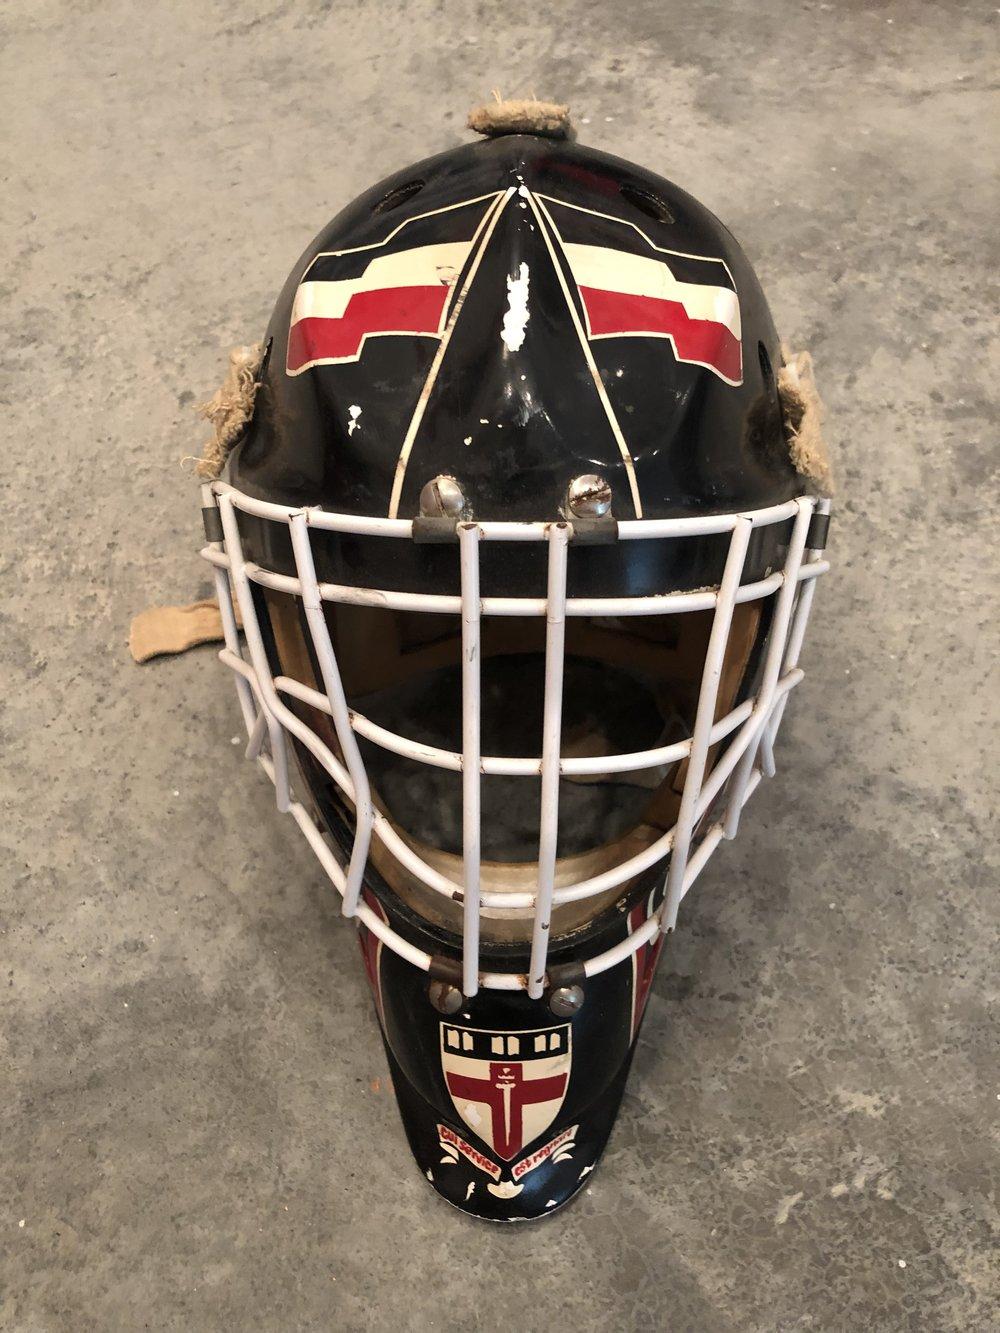 1992-96 Damian Zunino Groton School game worn mask